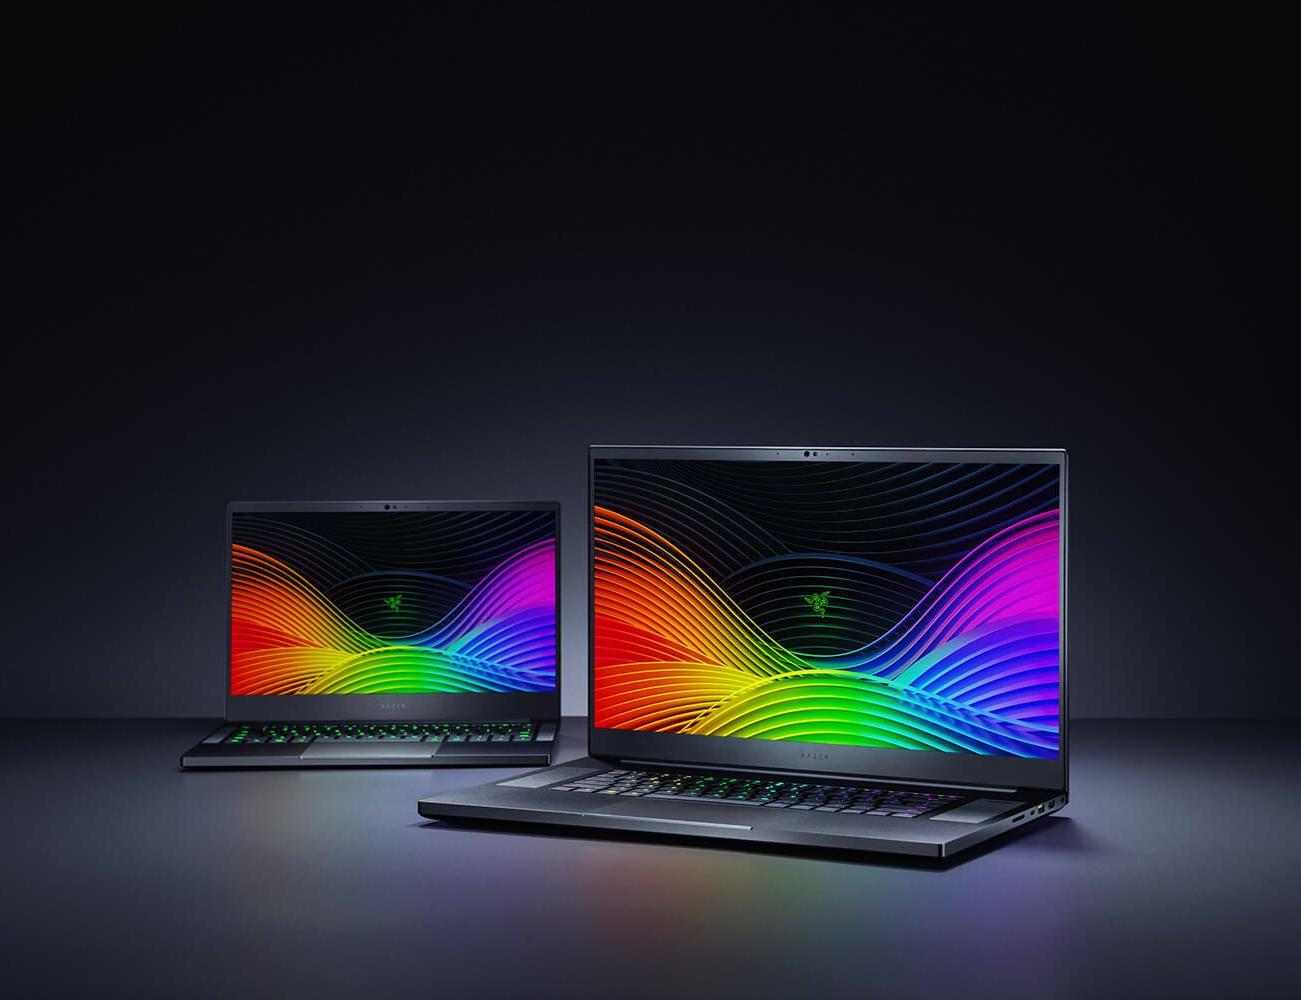 8 Gaming laptops worthy of taking you to the next level - Razer Blade Pro 17 02